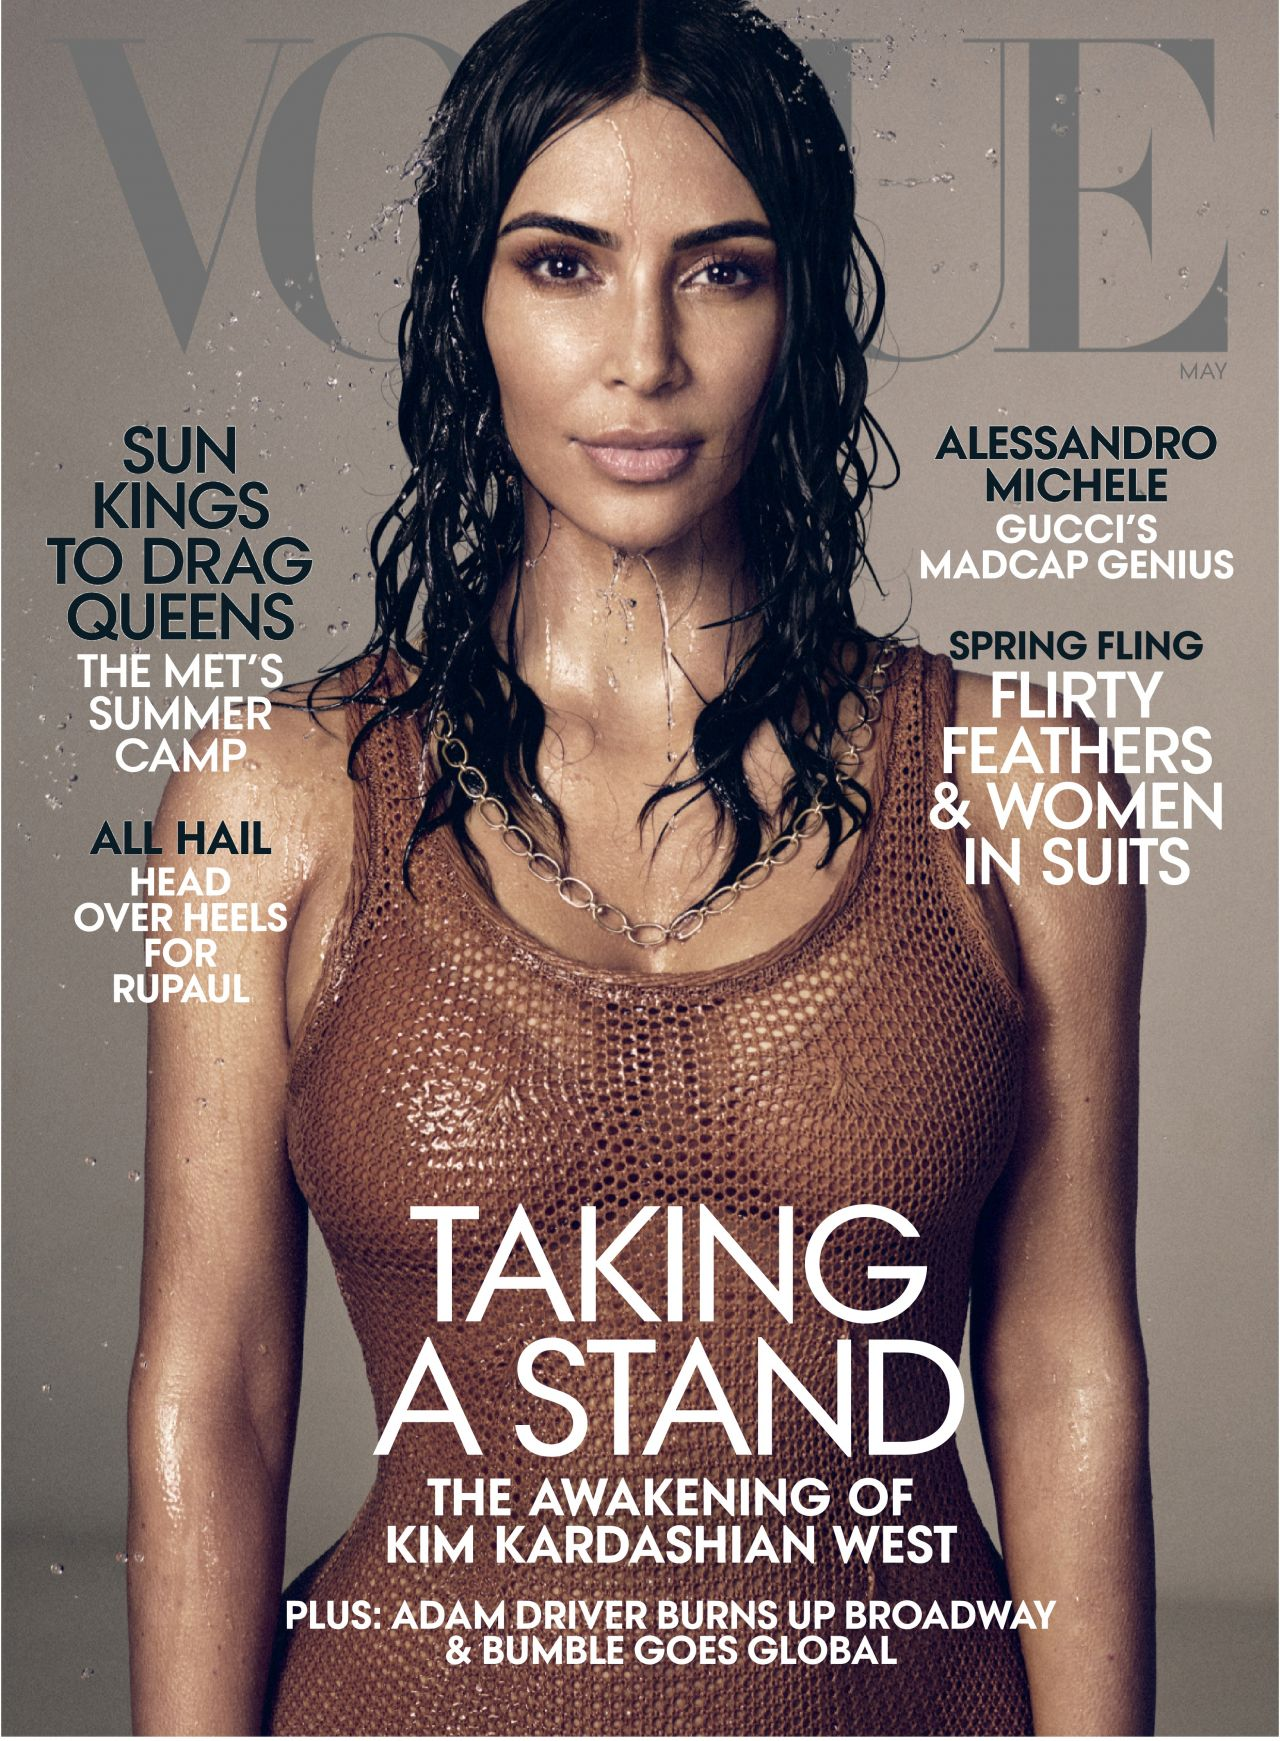 Vogue Magazine Subscription: Vogue Magazine May 2019 Issue